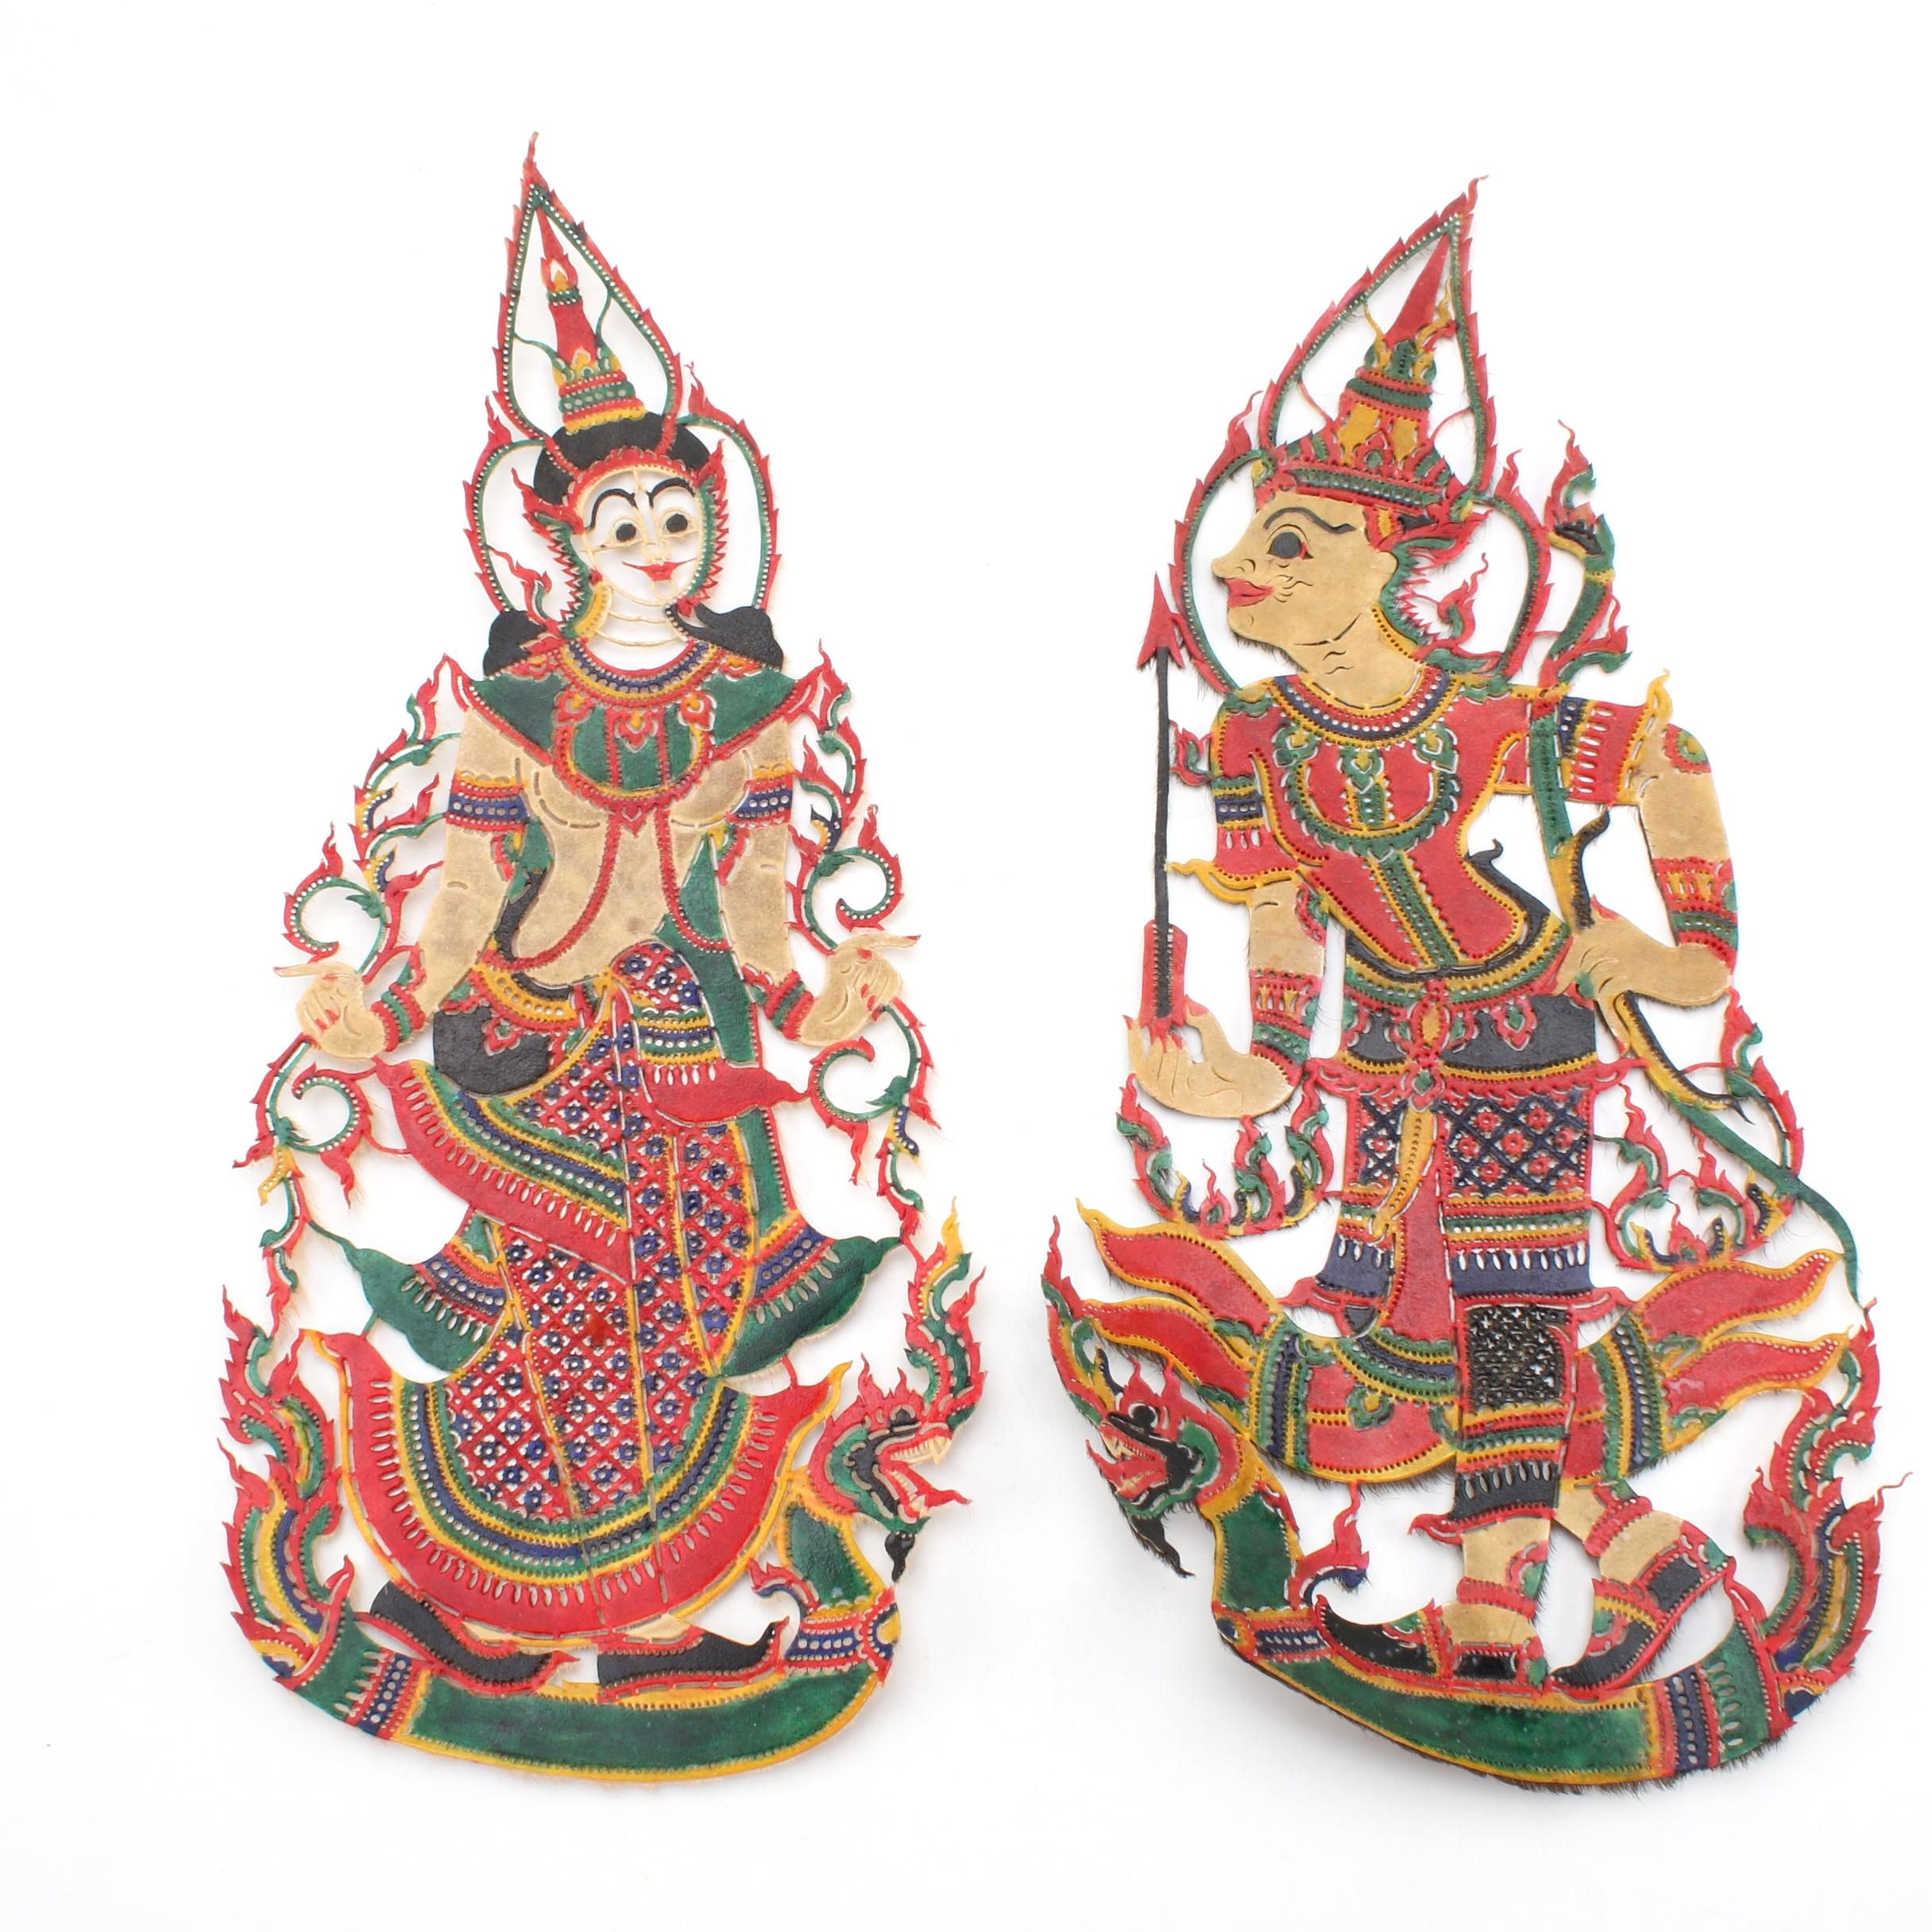 Thai Pierced Hide Nang Yai Shadow Puppets